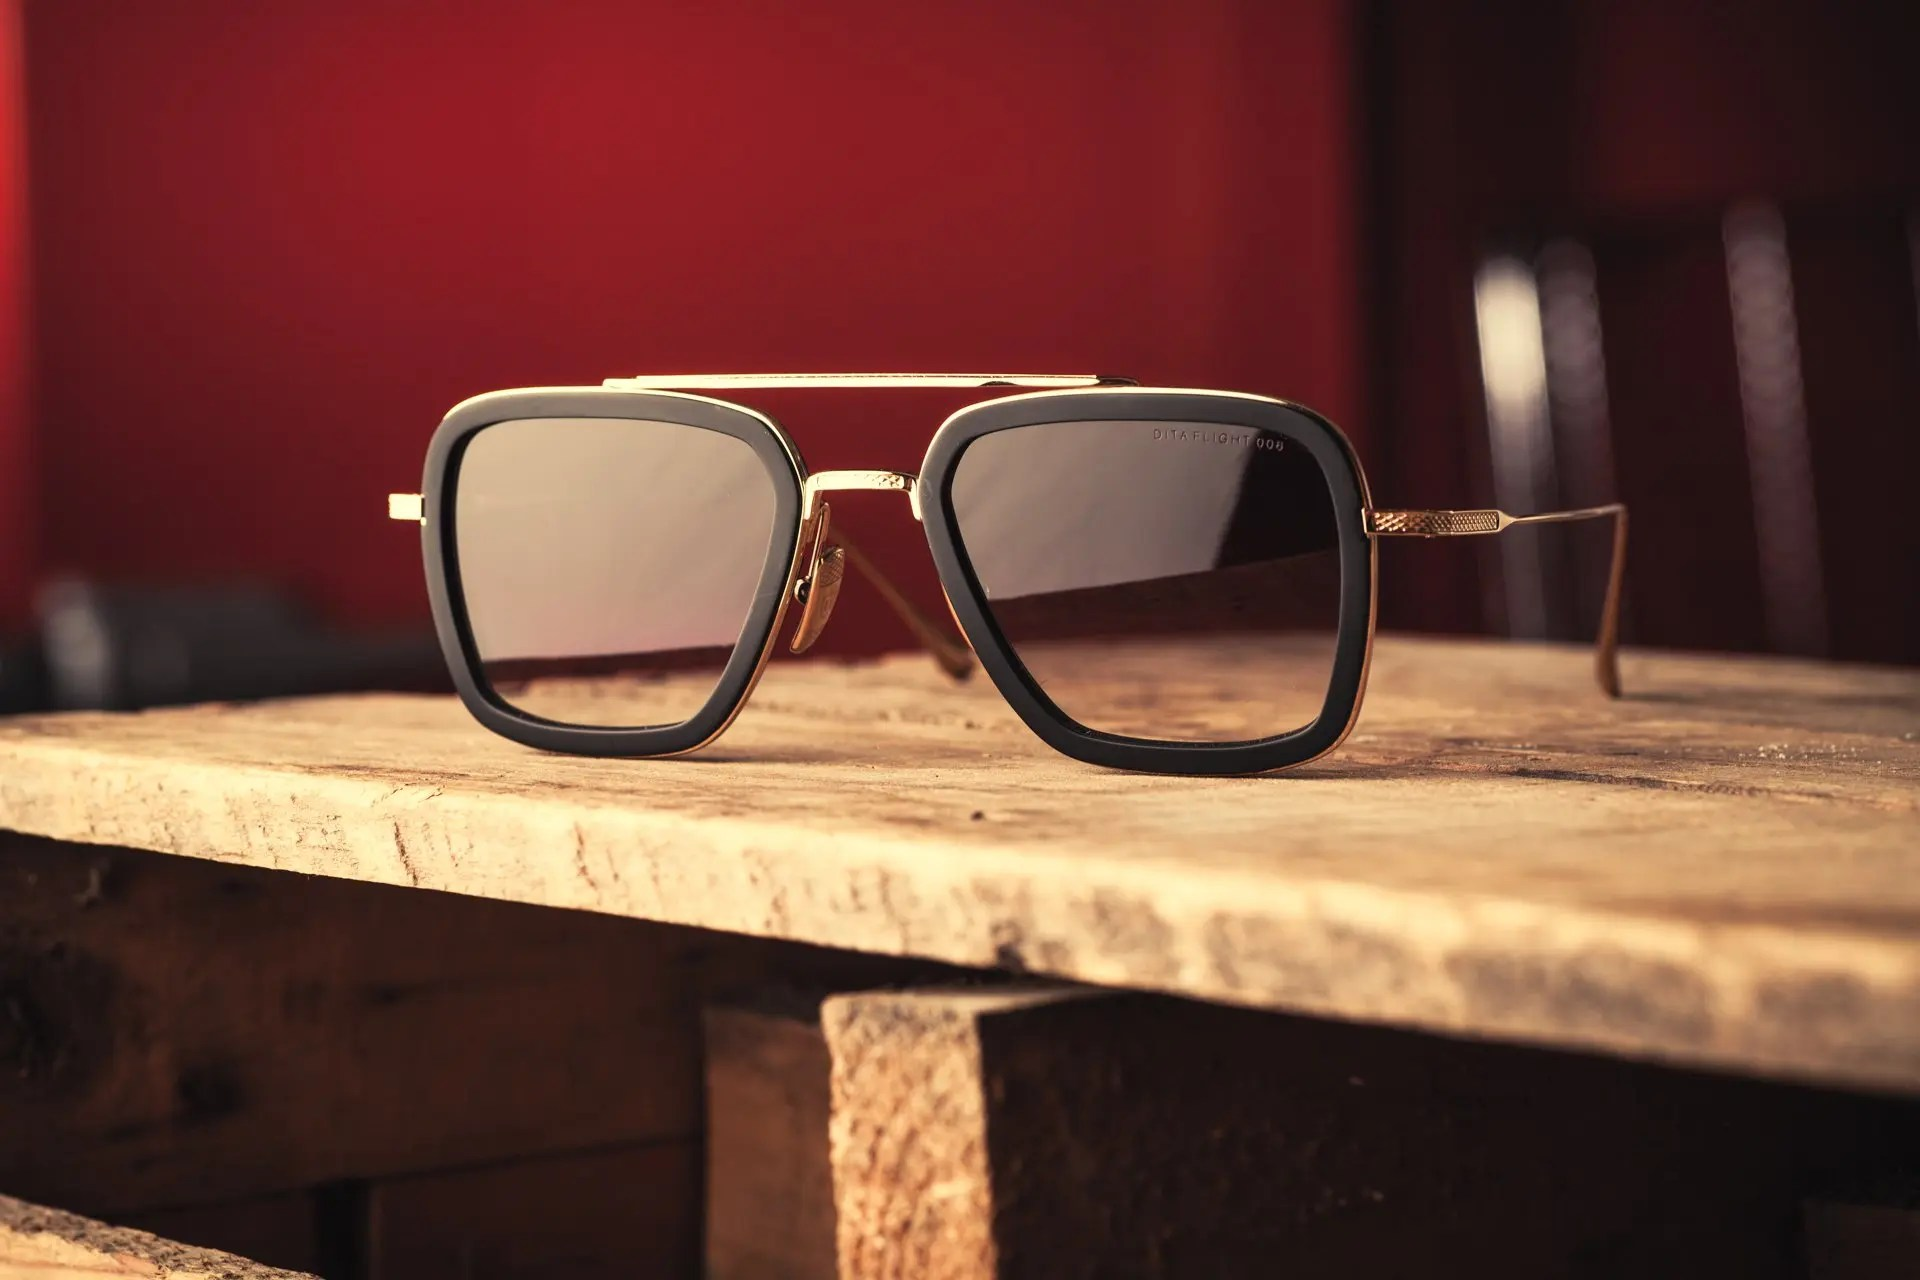 Dita Eyewear Insight Eye Care